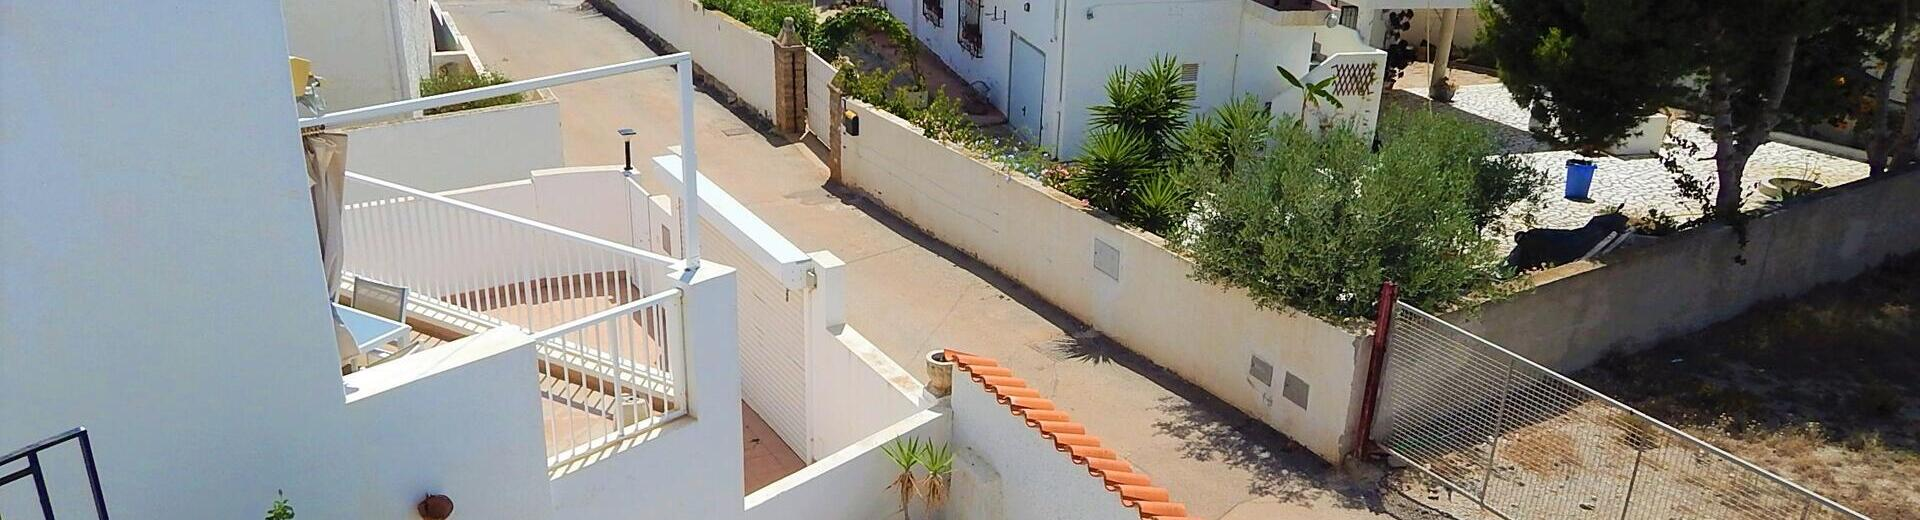 VIP7739: Villa à vendre